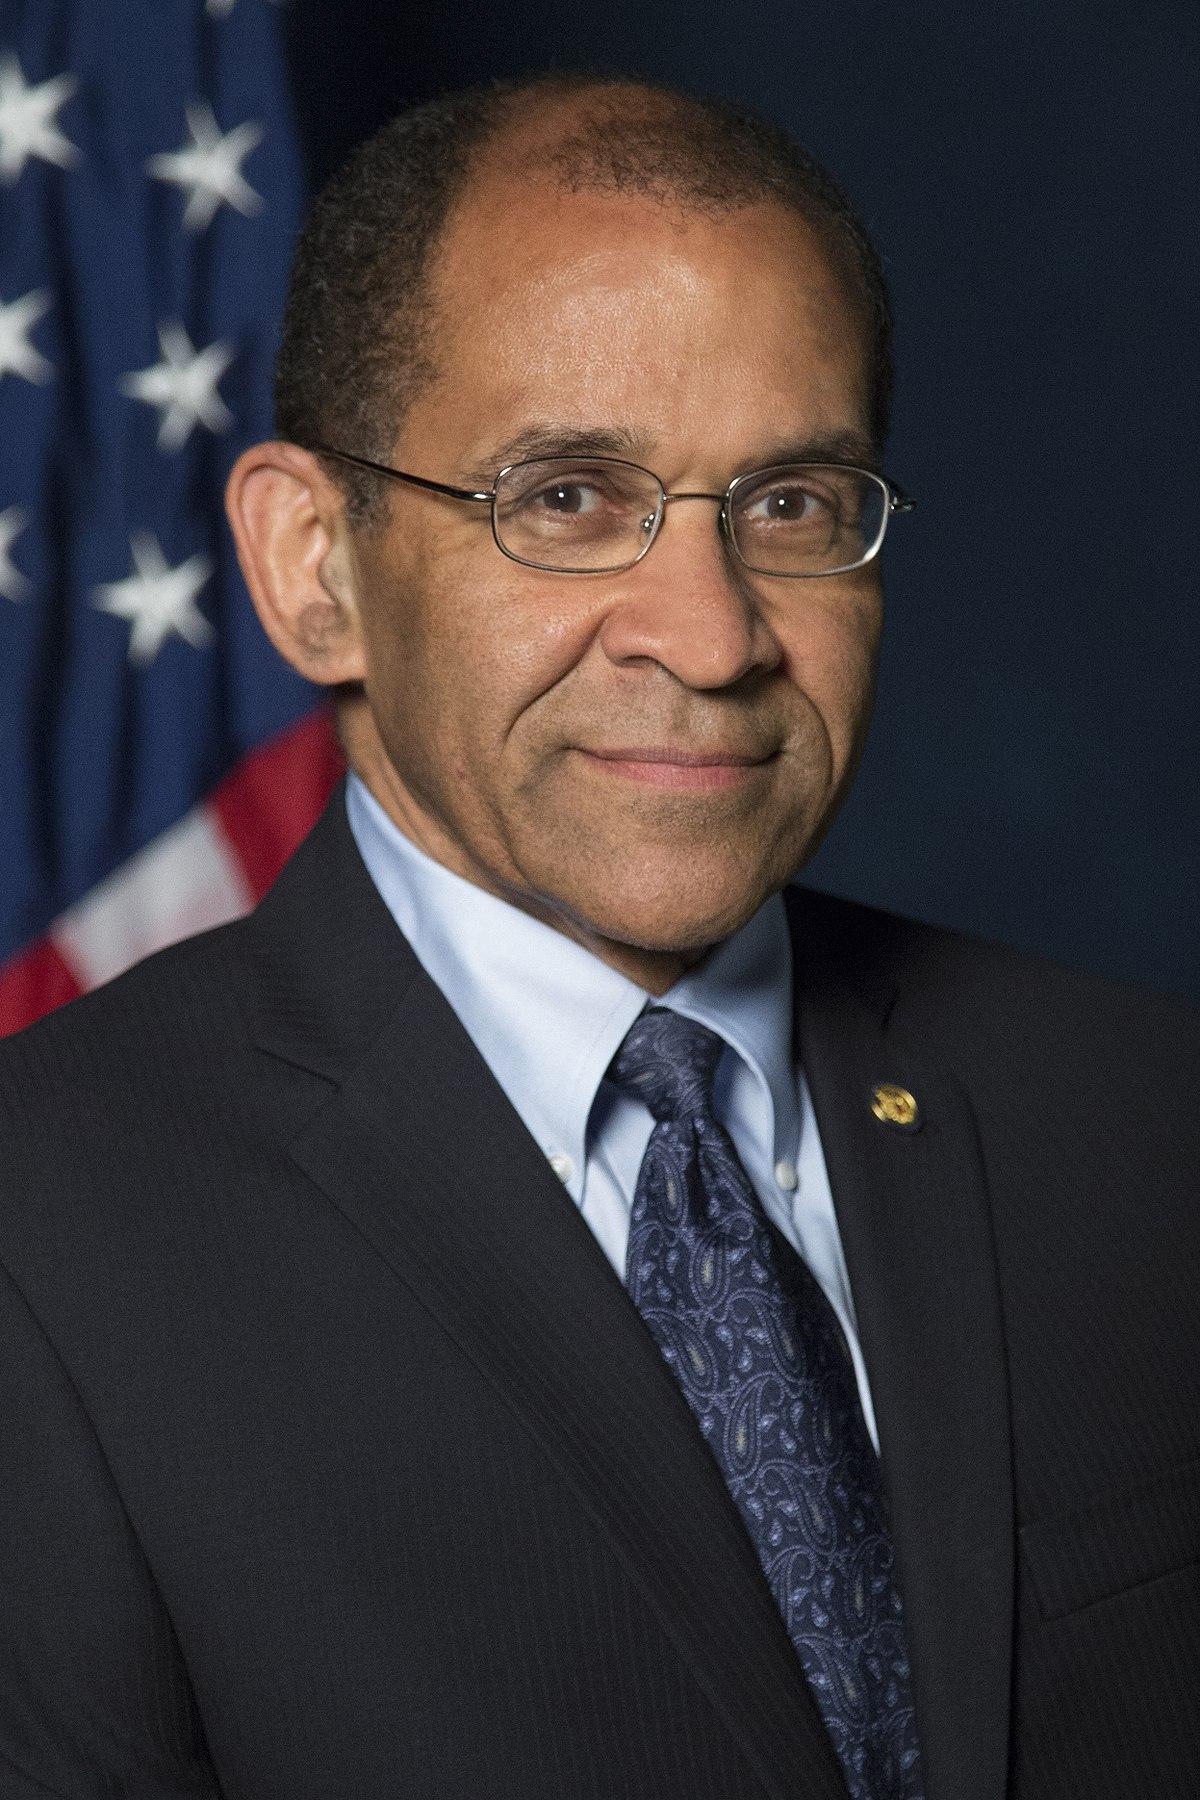 Ntsb >> Christopher A. Hart - Wikipedia